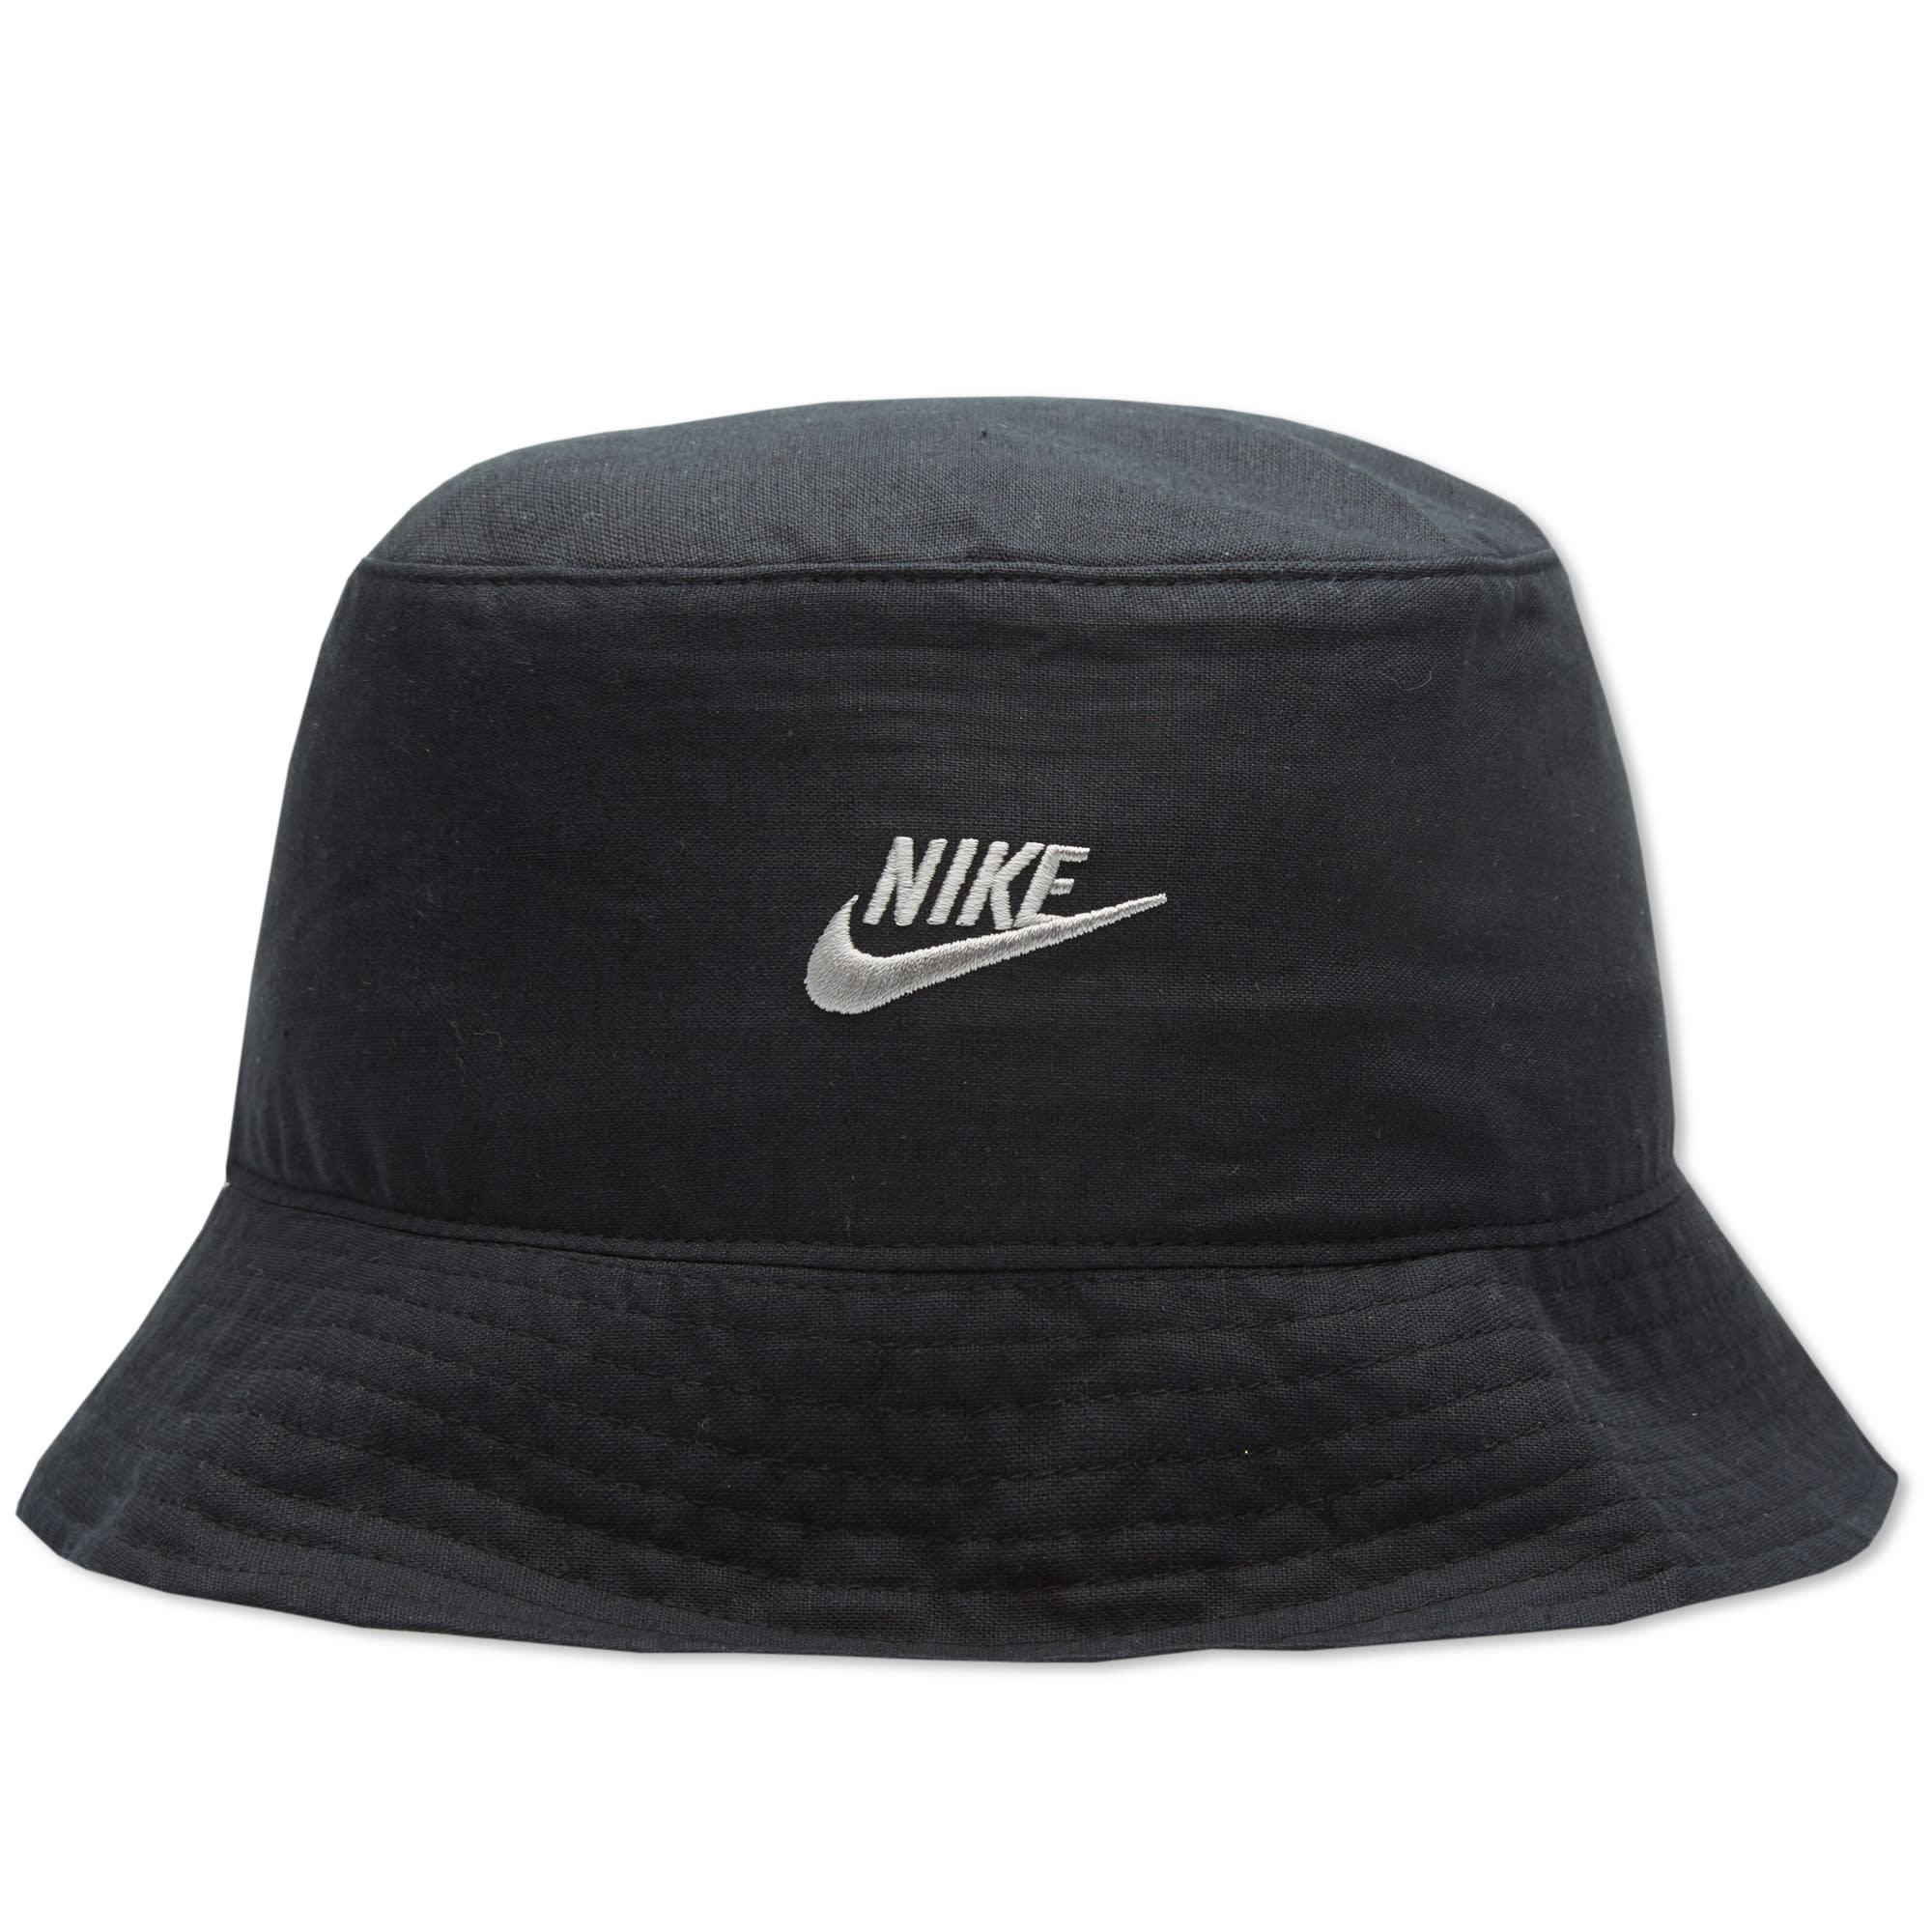 Nike Bucket Hat Black End